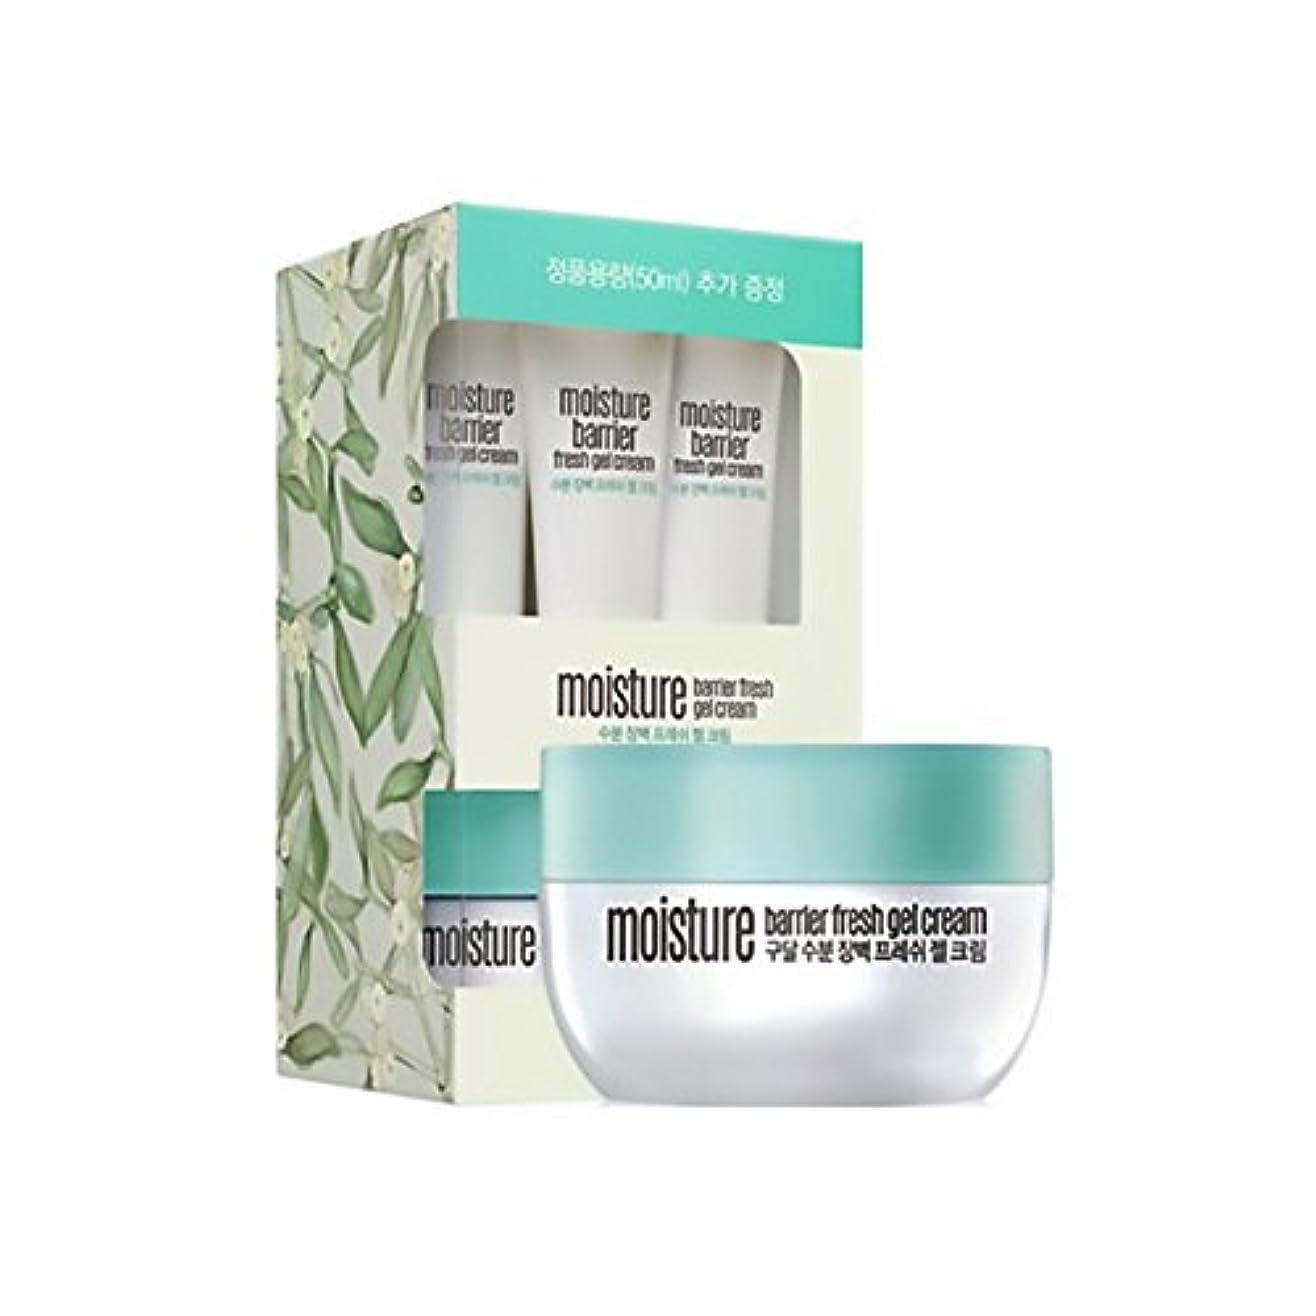 蚊猫背無秩序goodal moisture barrier fresh gel cream set